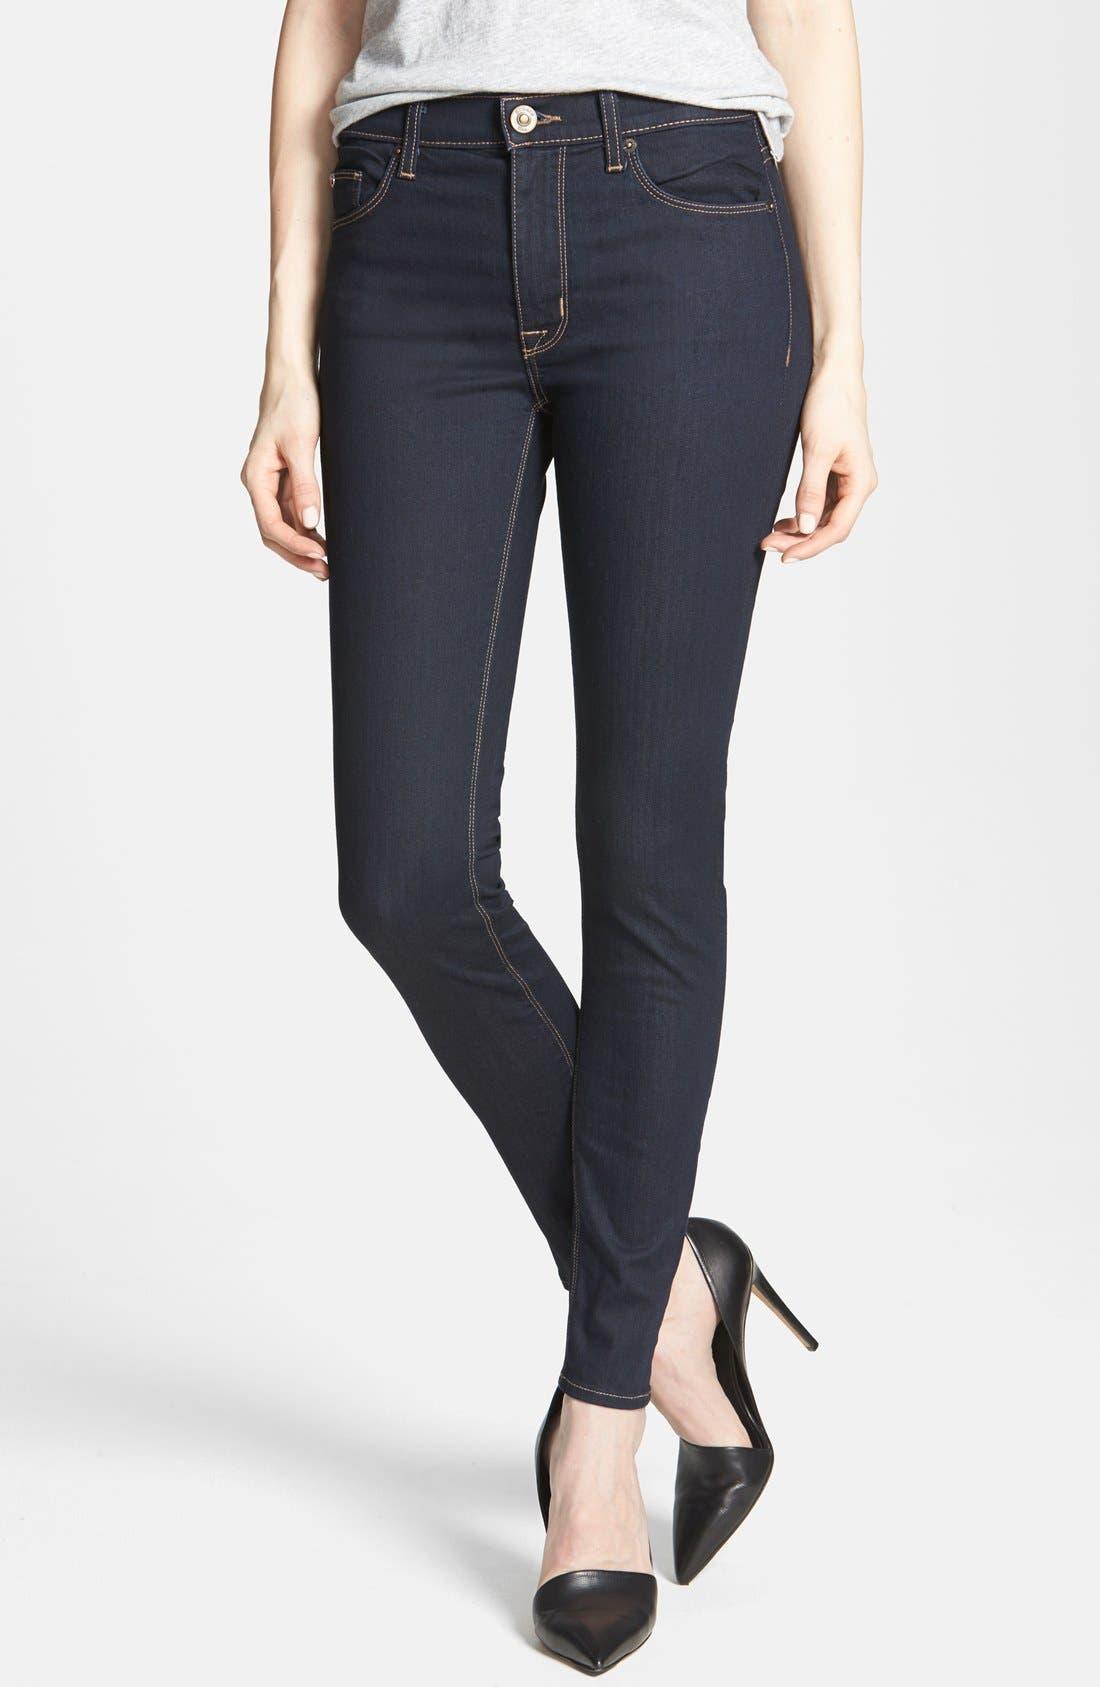 Hudson barbara high rise skinny jeans in storm